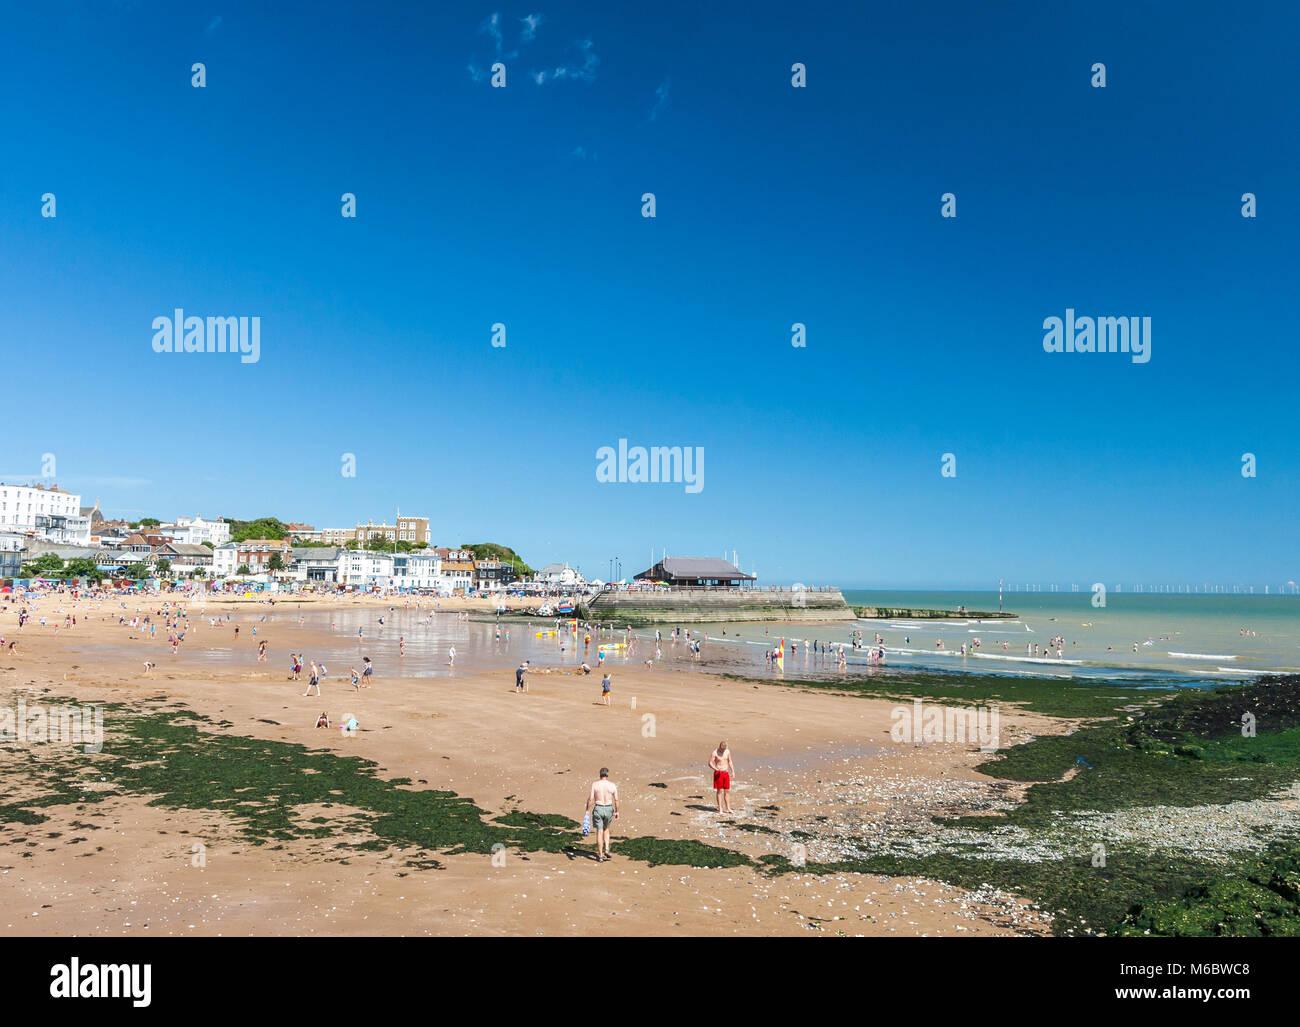 people having fun on Viking Bay Beach, Broadstairs, Kent, England - Stock Image